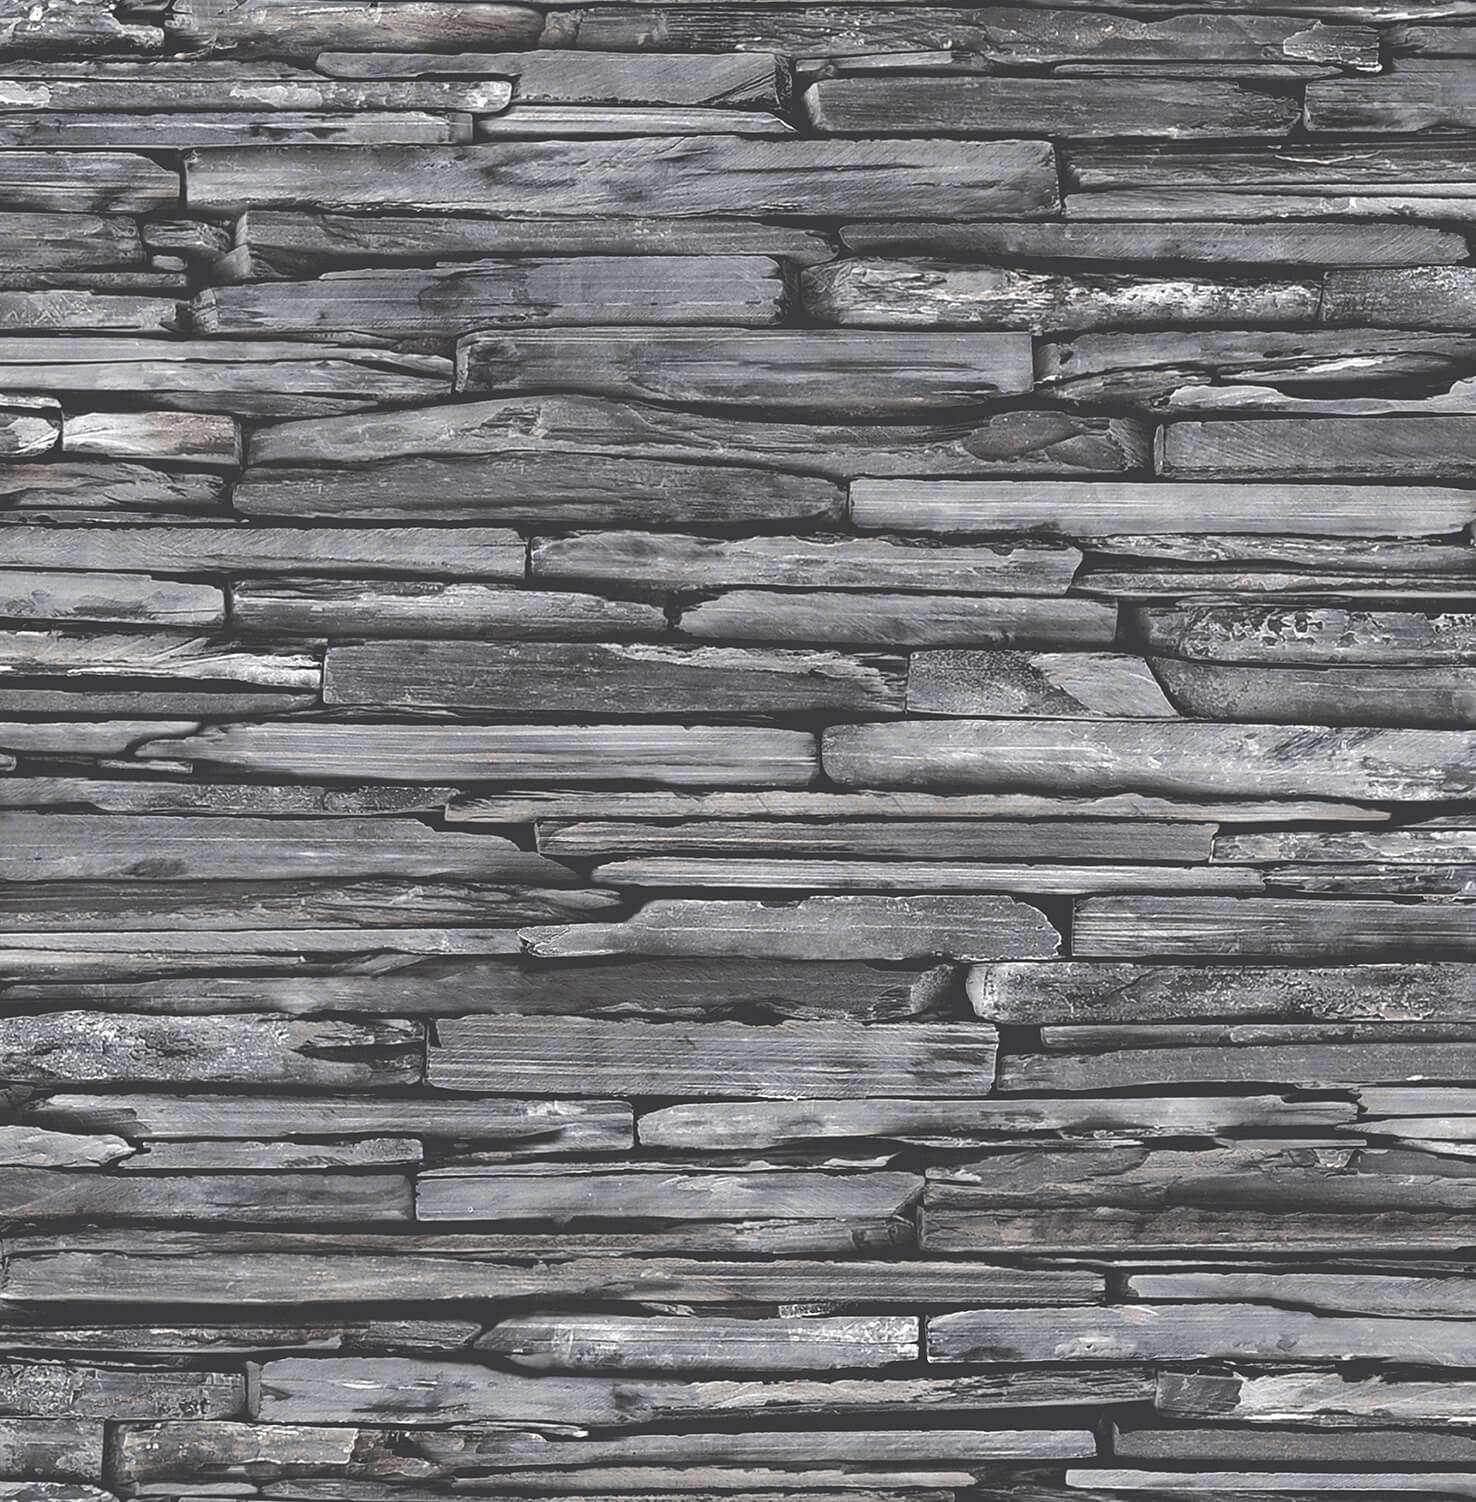 Wallpaper Stone Style Wand Rasch Textil Black 022352 001